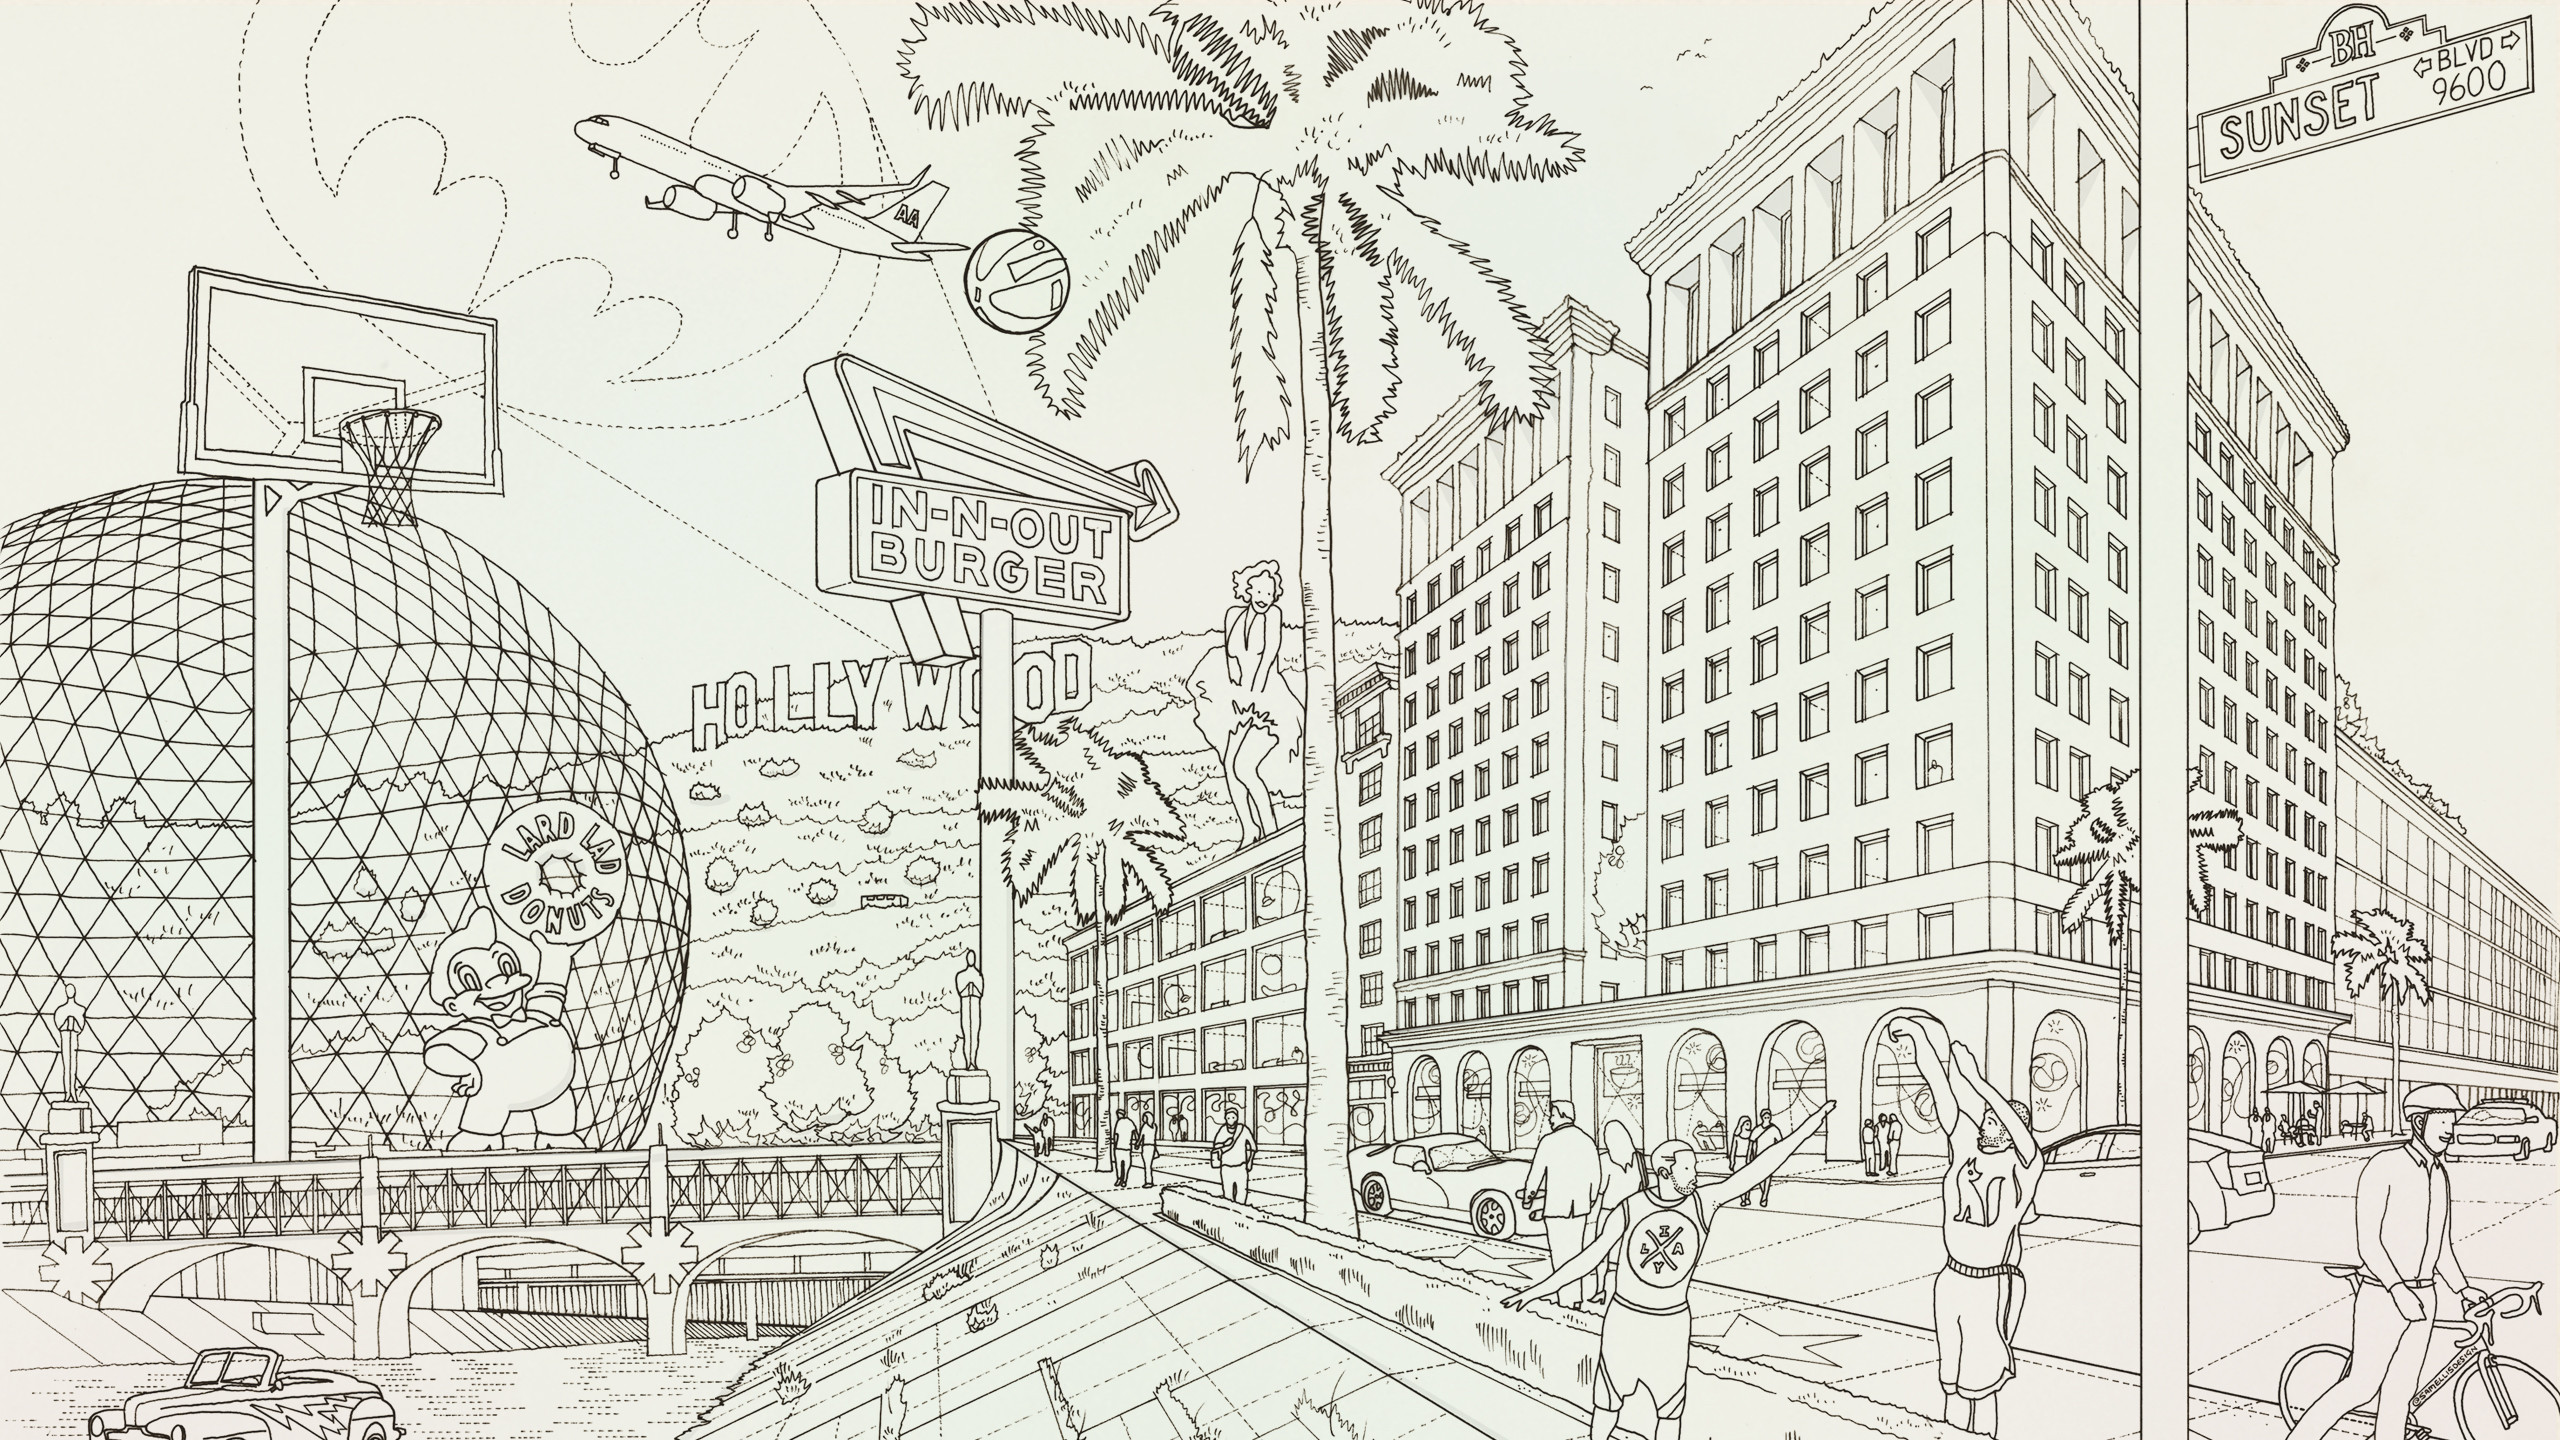 The Desktop Wallpaper Project featuring Sam Ellis Design-wallpaper-2560×1440.jpg  2,560×